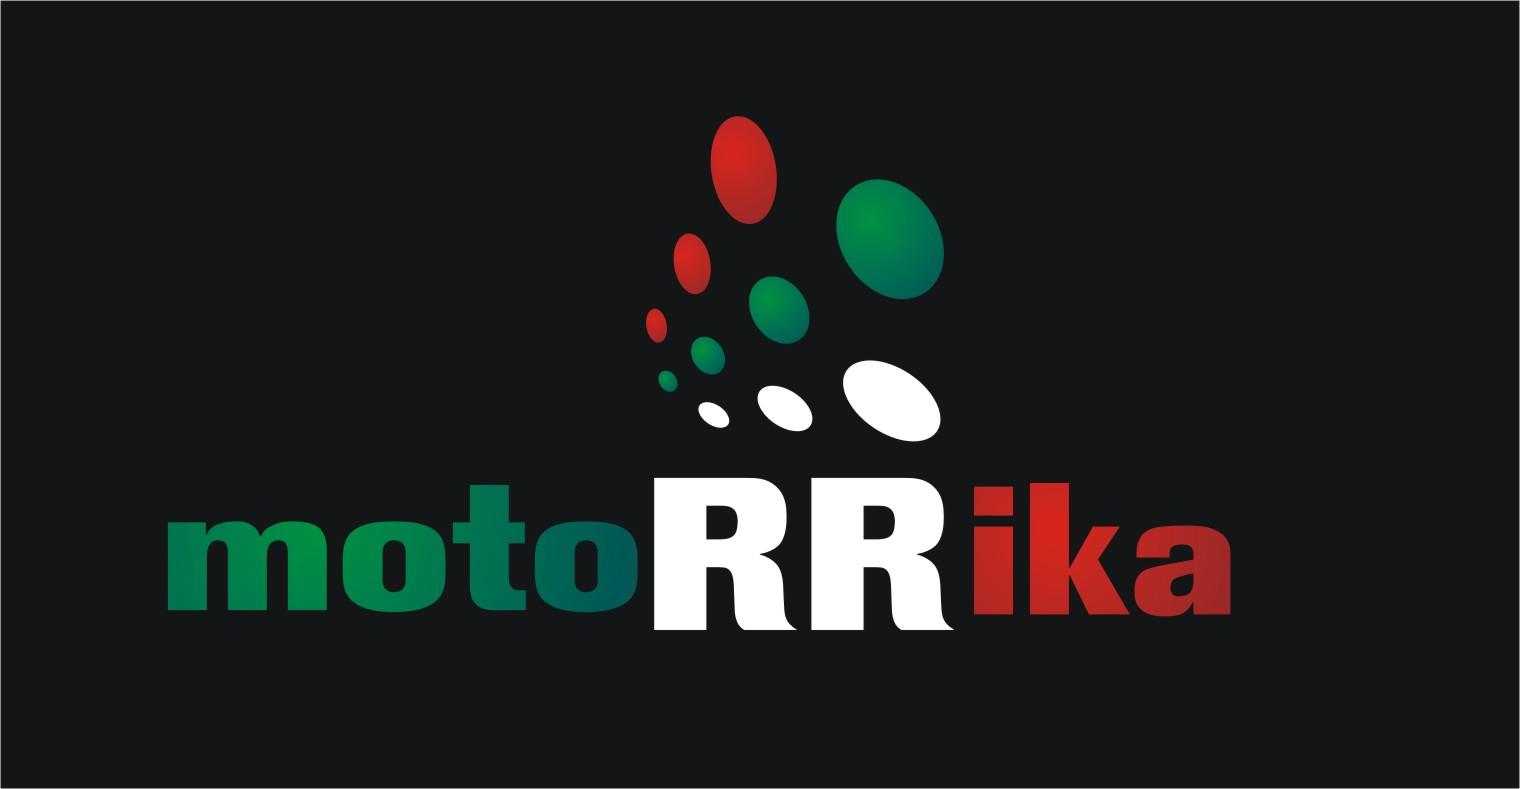 Мотогонки. Логотип, фирменный стиль. фото f_4dbd39eae6f52.jpg